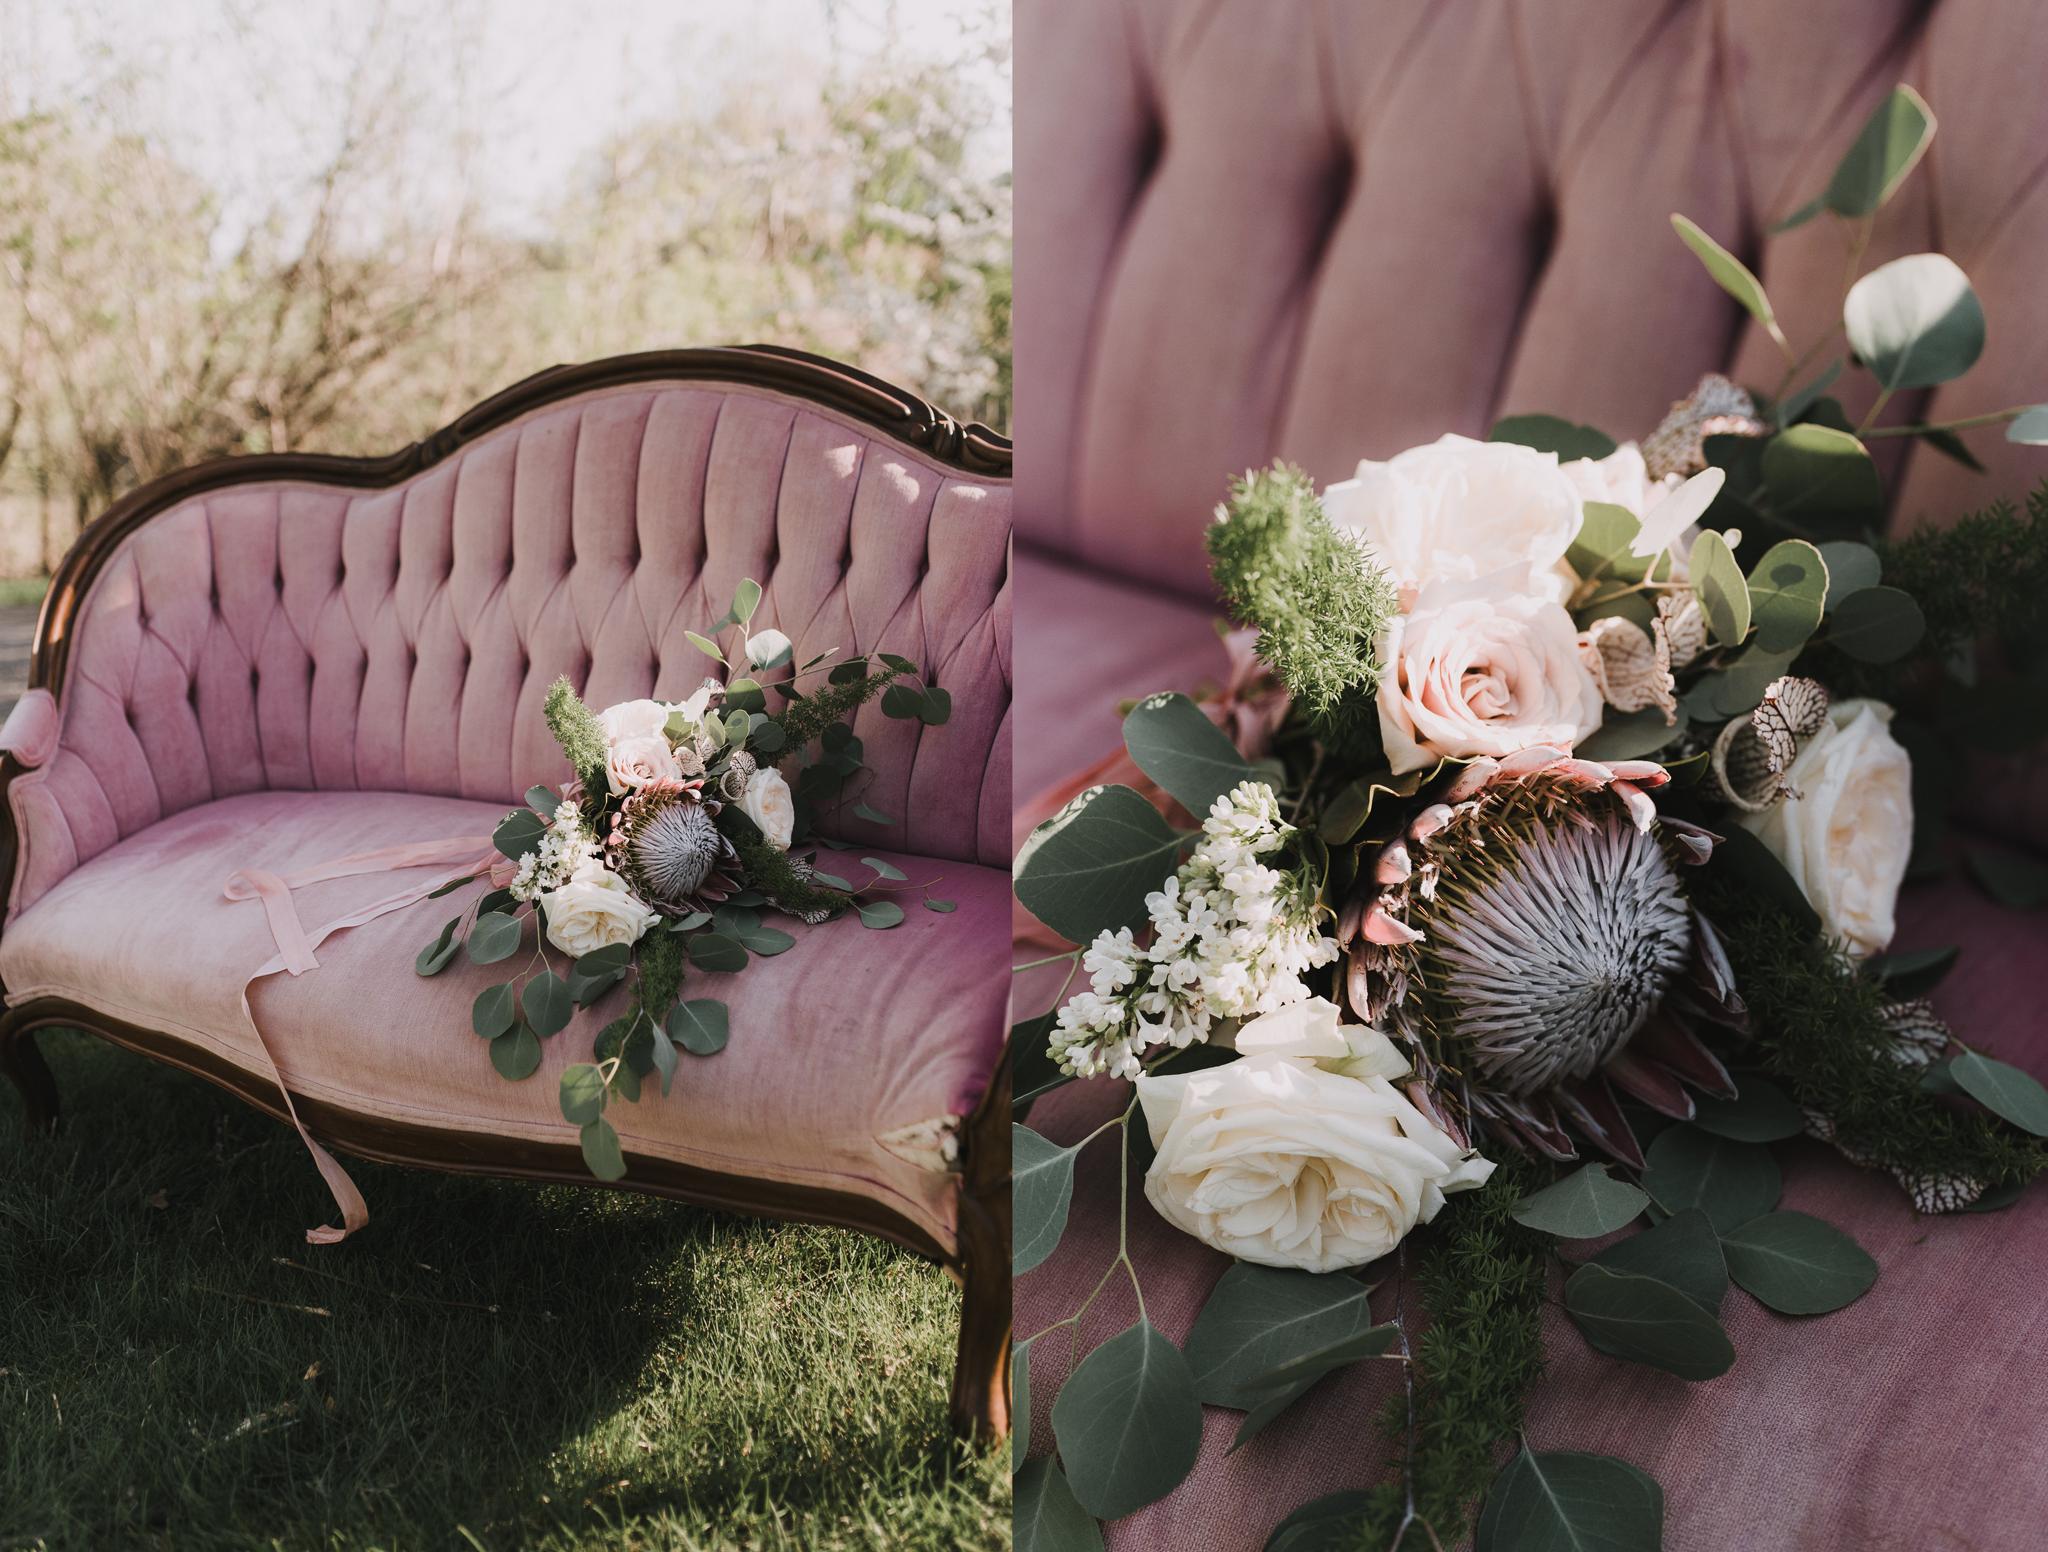 floral-bouquet-bismarck-fargo-furniture-antique-rantal.png